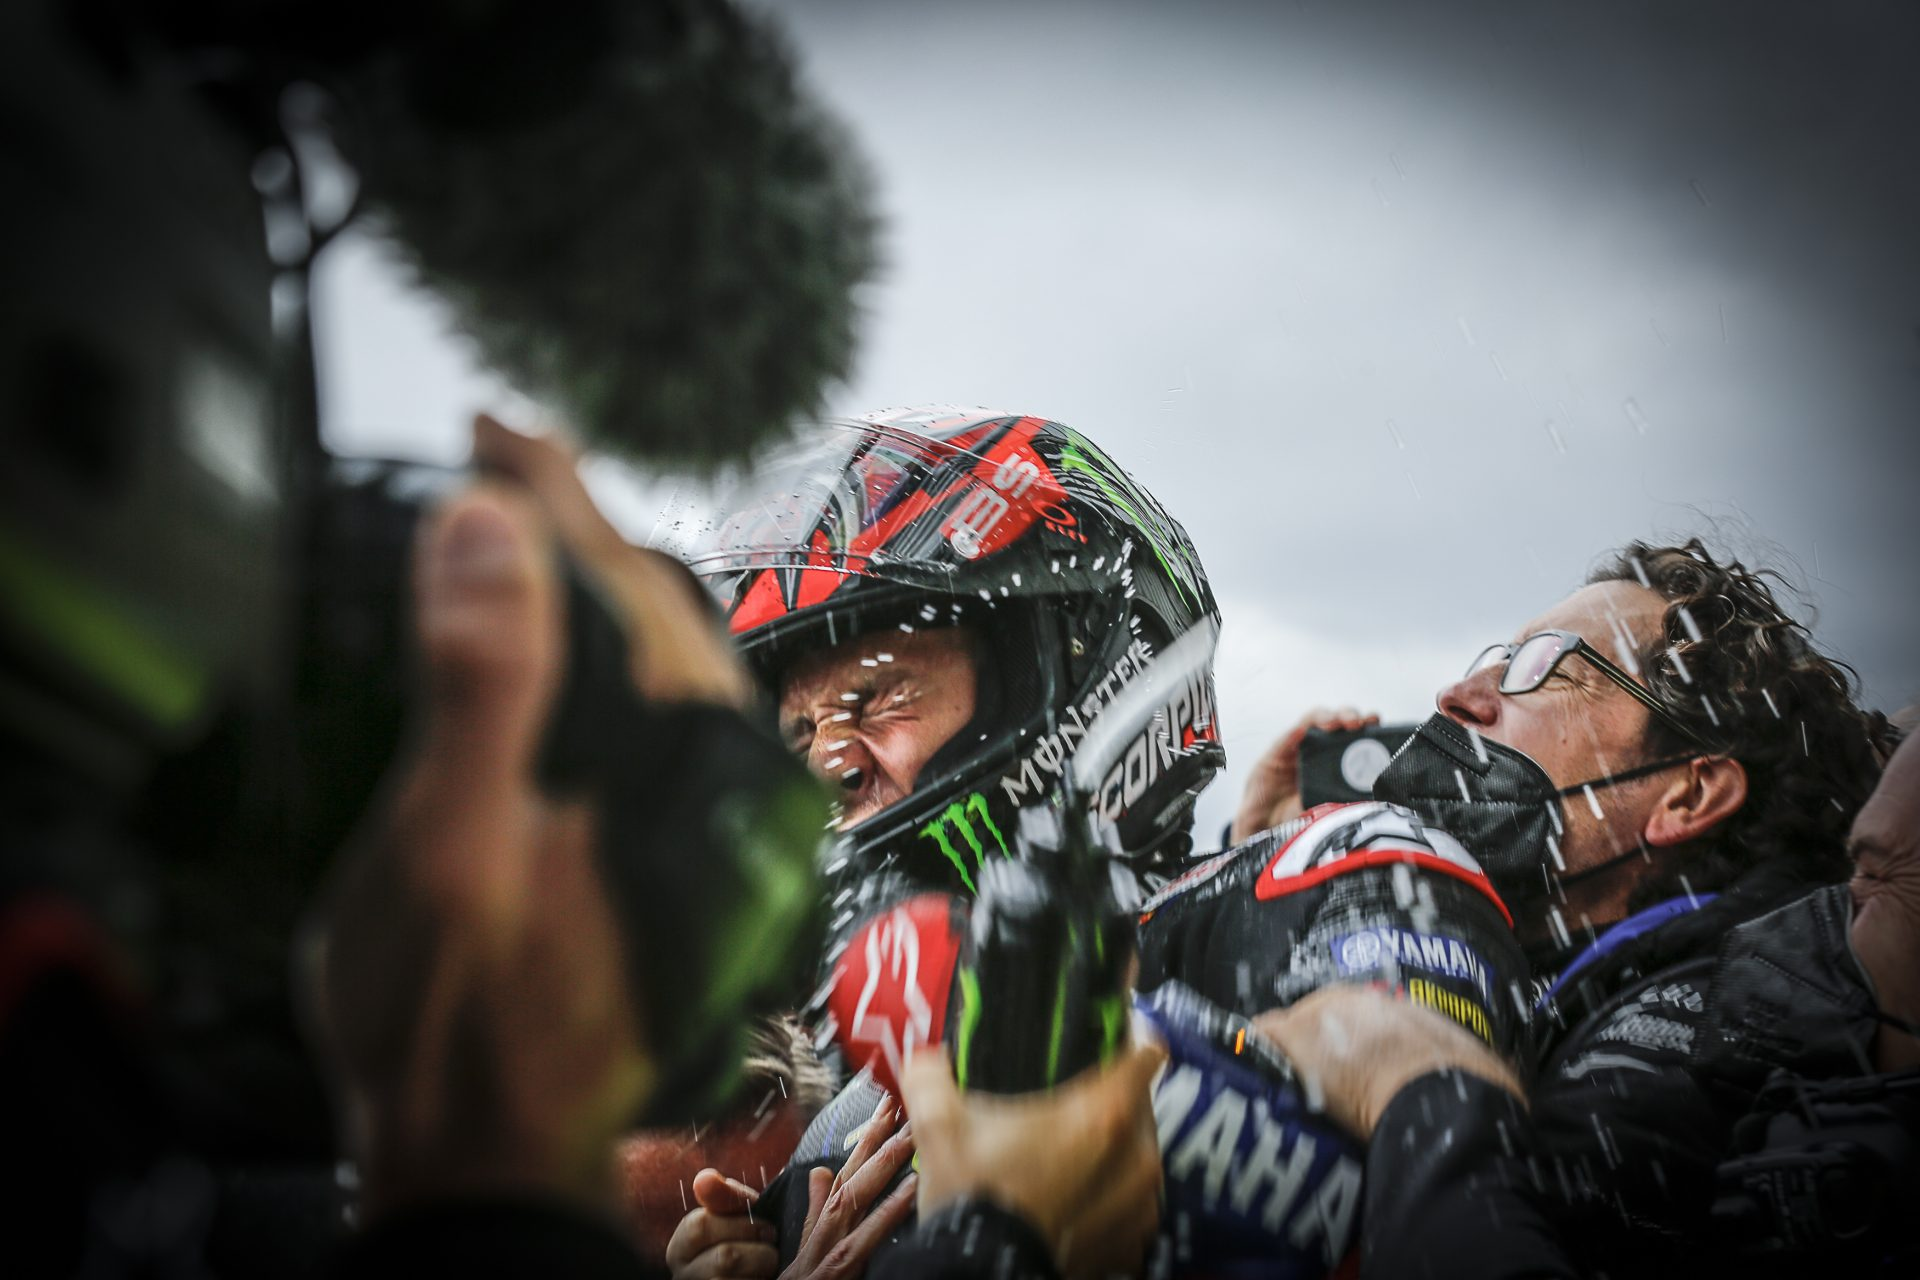 Quartararo wins, Rins second as Aleix Espargaro makes history at Silverstone